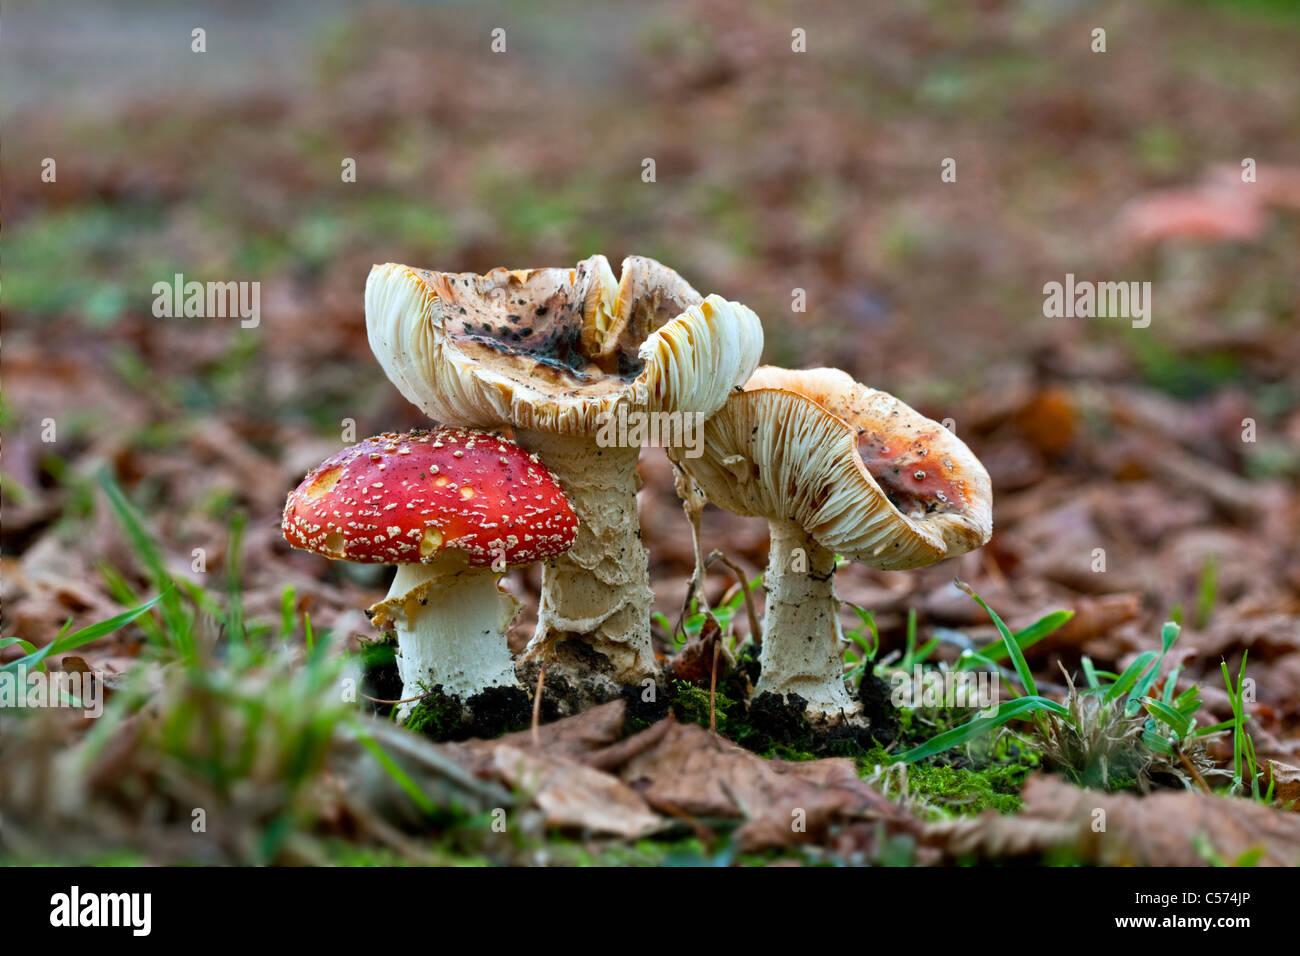 The Netherlands, Denekamp, Estate Singraven. Autumn. Fly Fungus. Amanita Muscaria. Fly agaric. Stock Photo